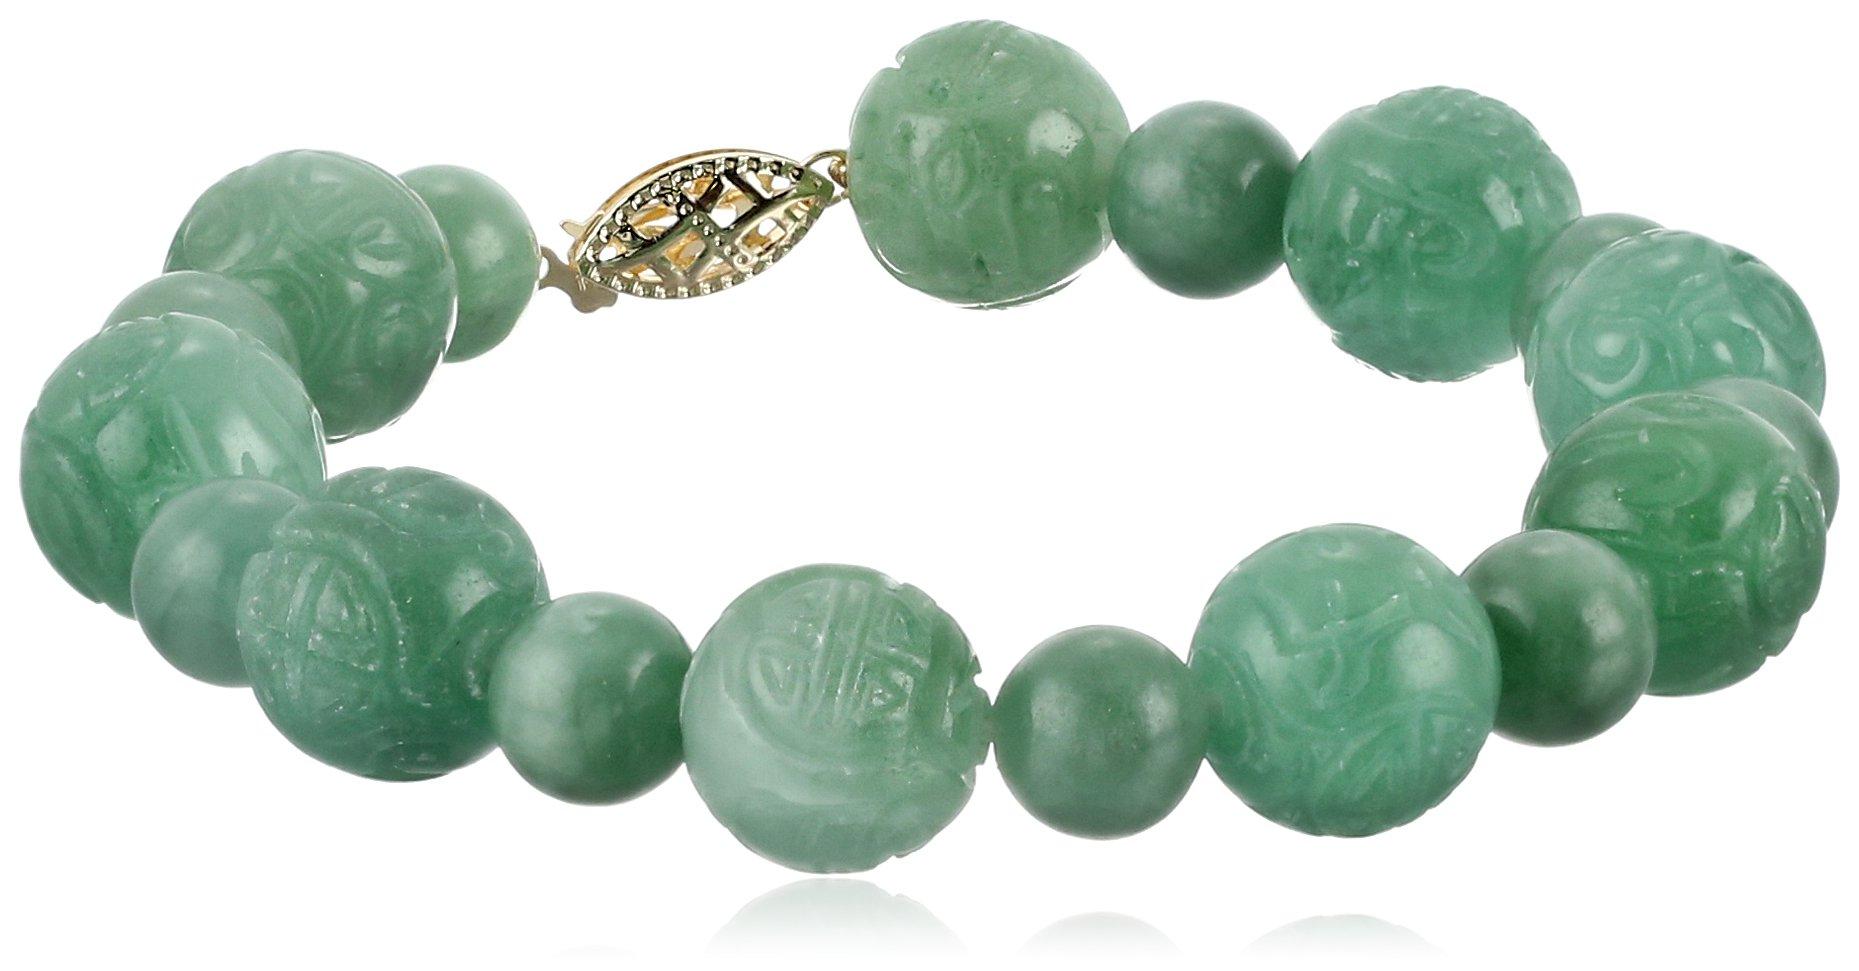 14k Yellow Gold Green Jade Carved Bead Strand Bracelet